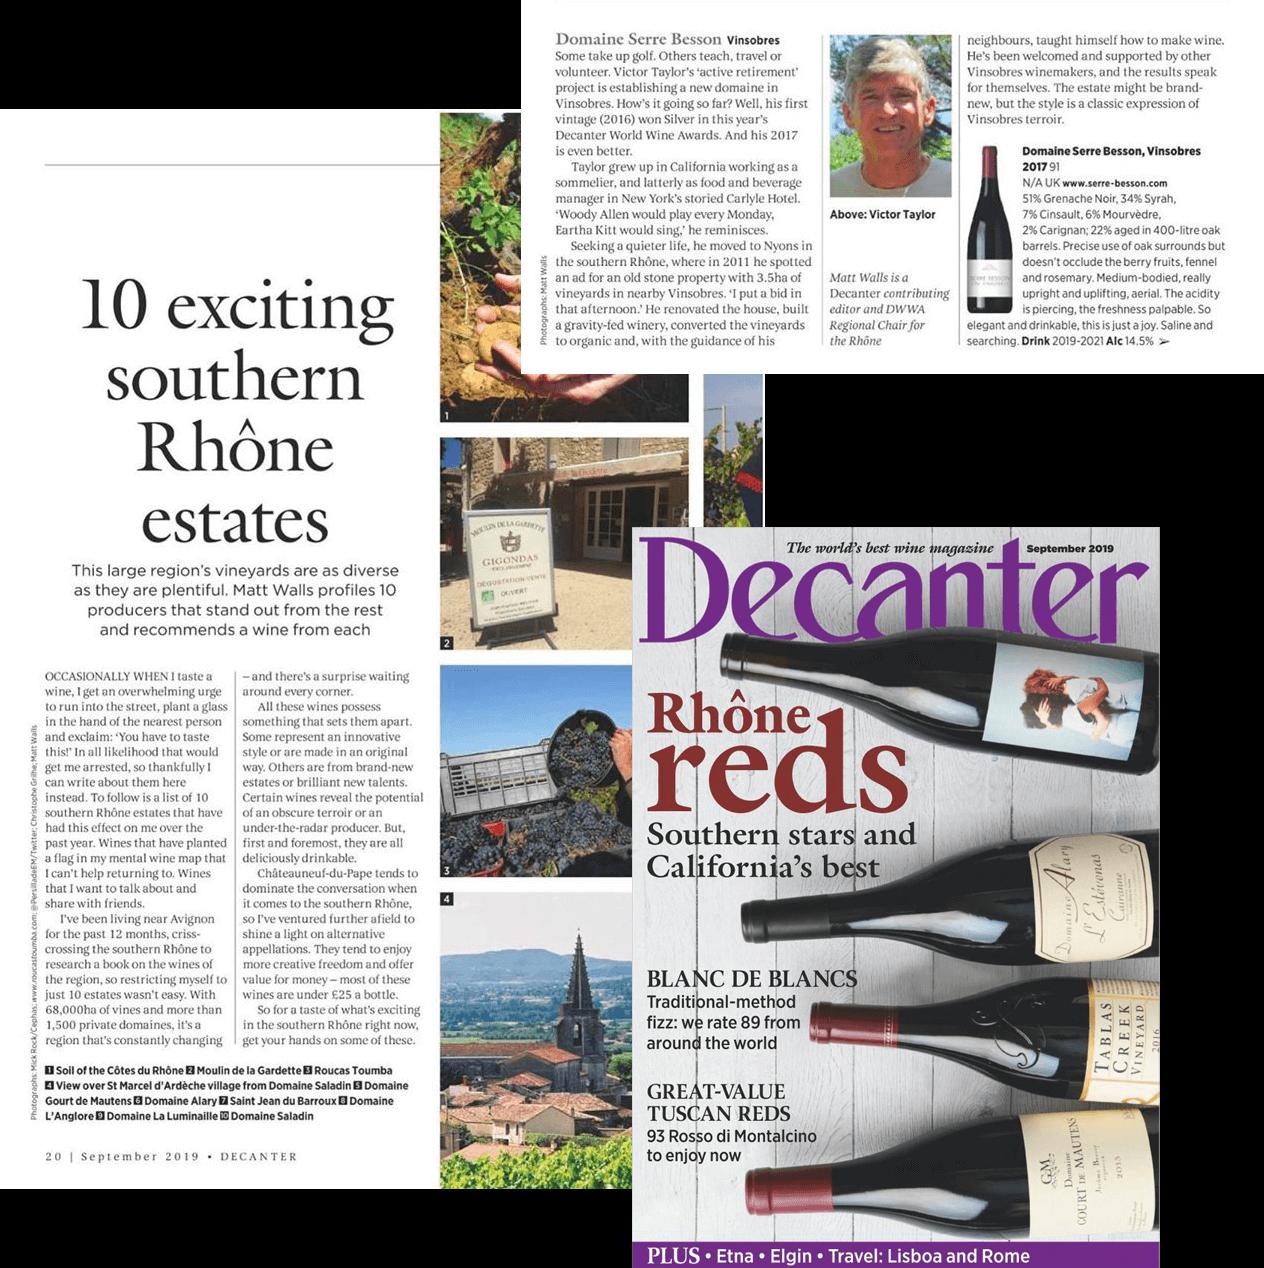 Decanter september 2019 - Best wine magazine - 10 exciting southern Rhône estates - Serre Besson Vinsobre 2017